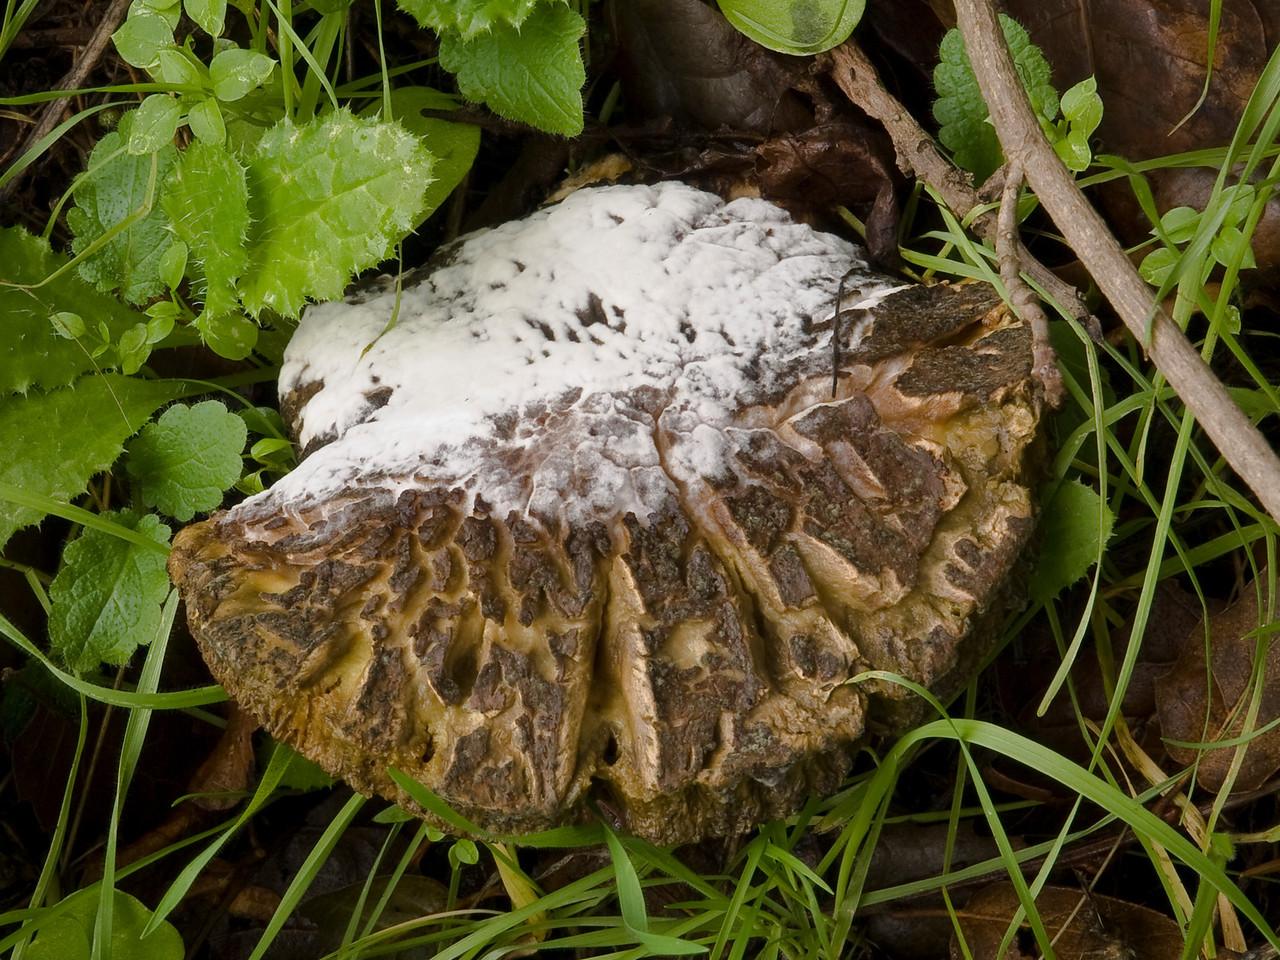 Hypomyces parasite on a mushroom